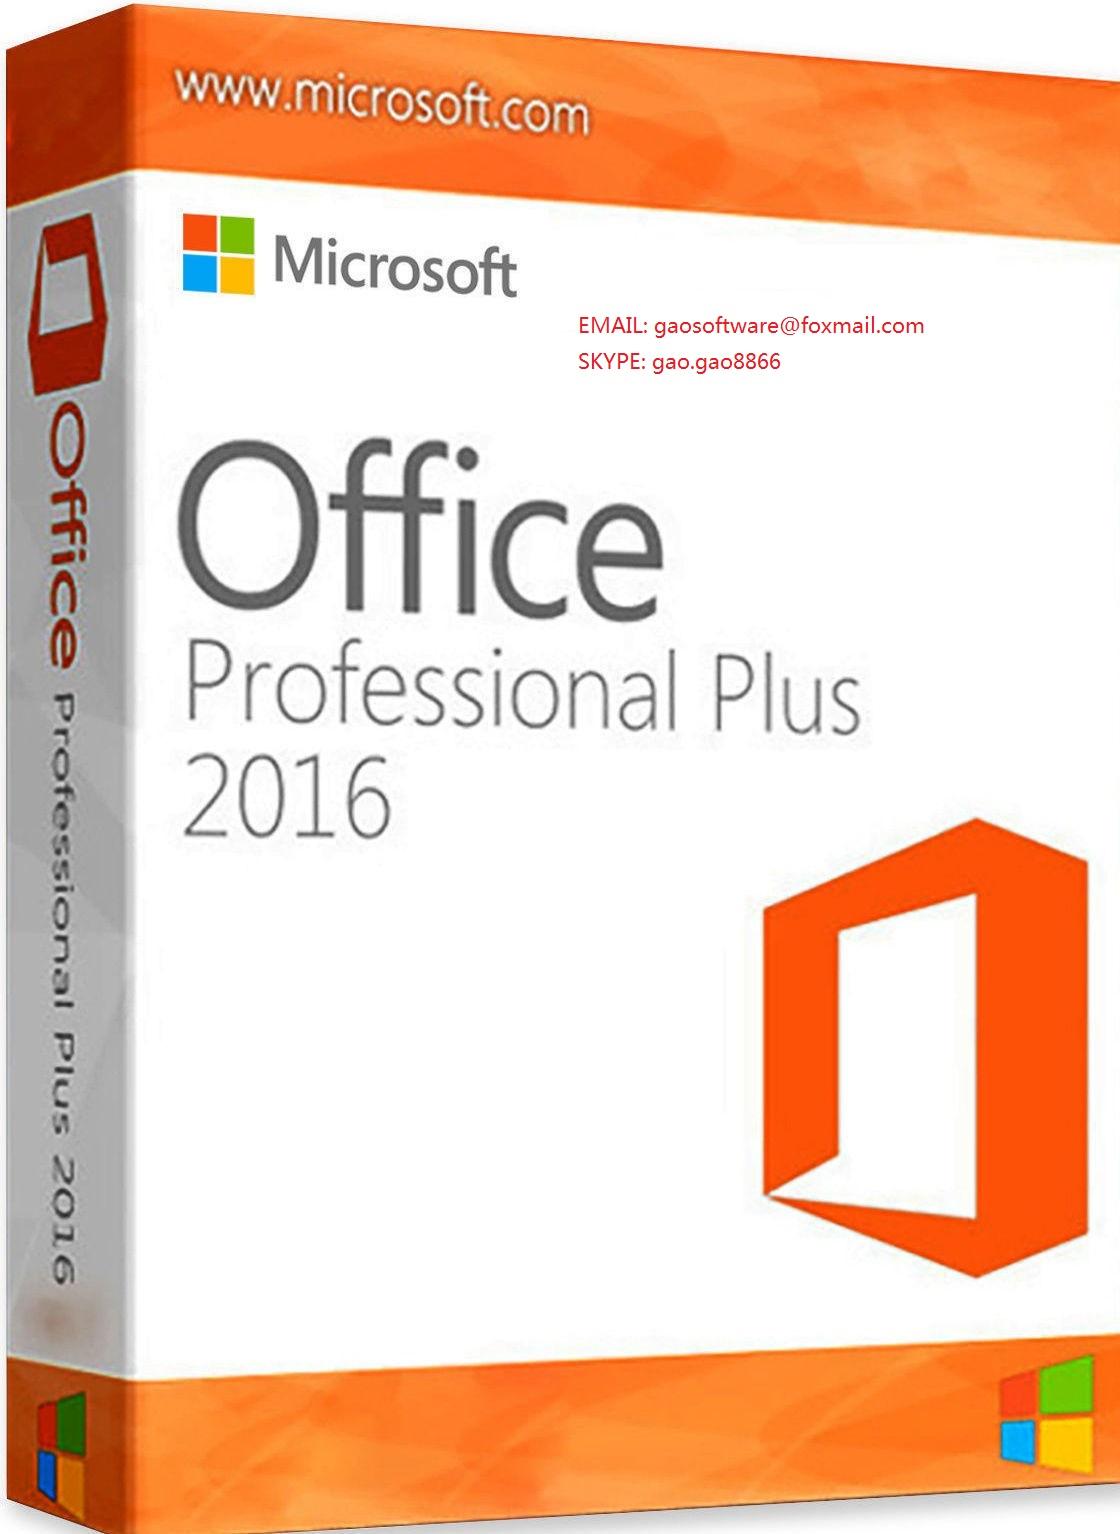 office 2016 professional plus key 100% online activation